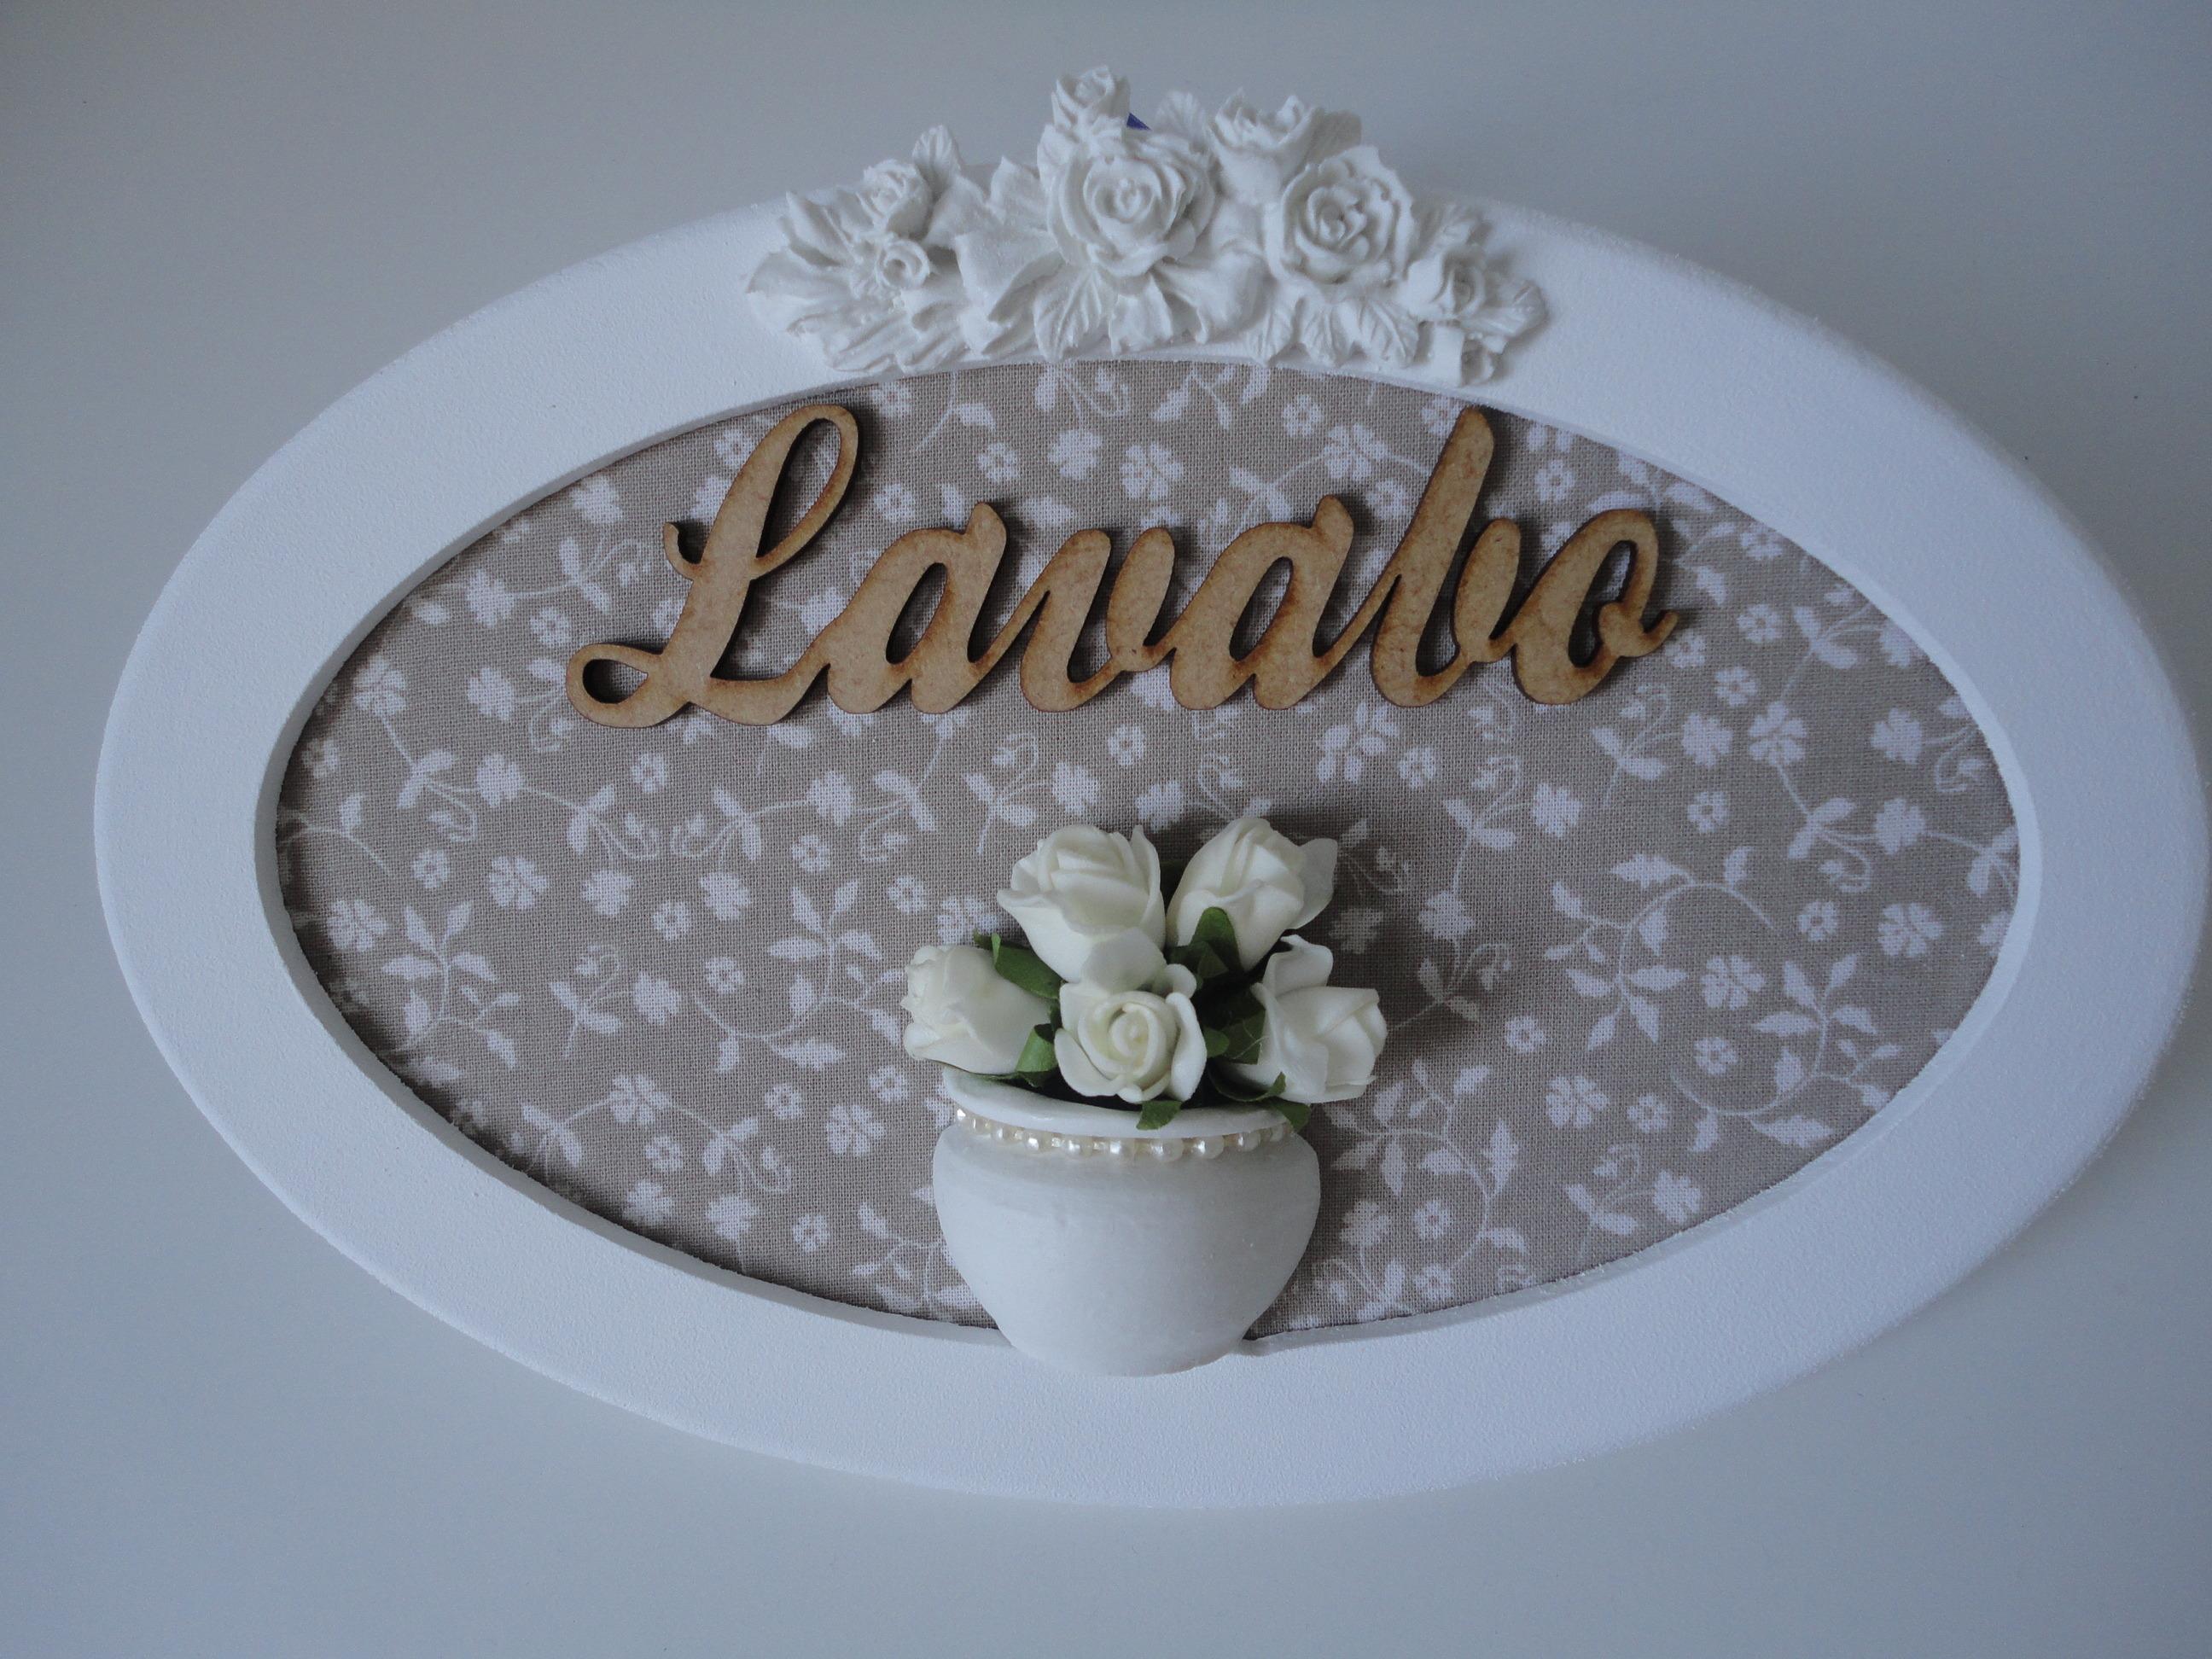 placa lavabo pronta entrega decoracao lavabo placa lavabo pronta  #614B37 2592 1944